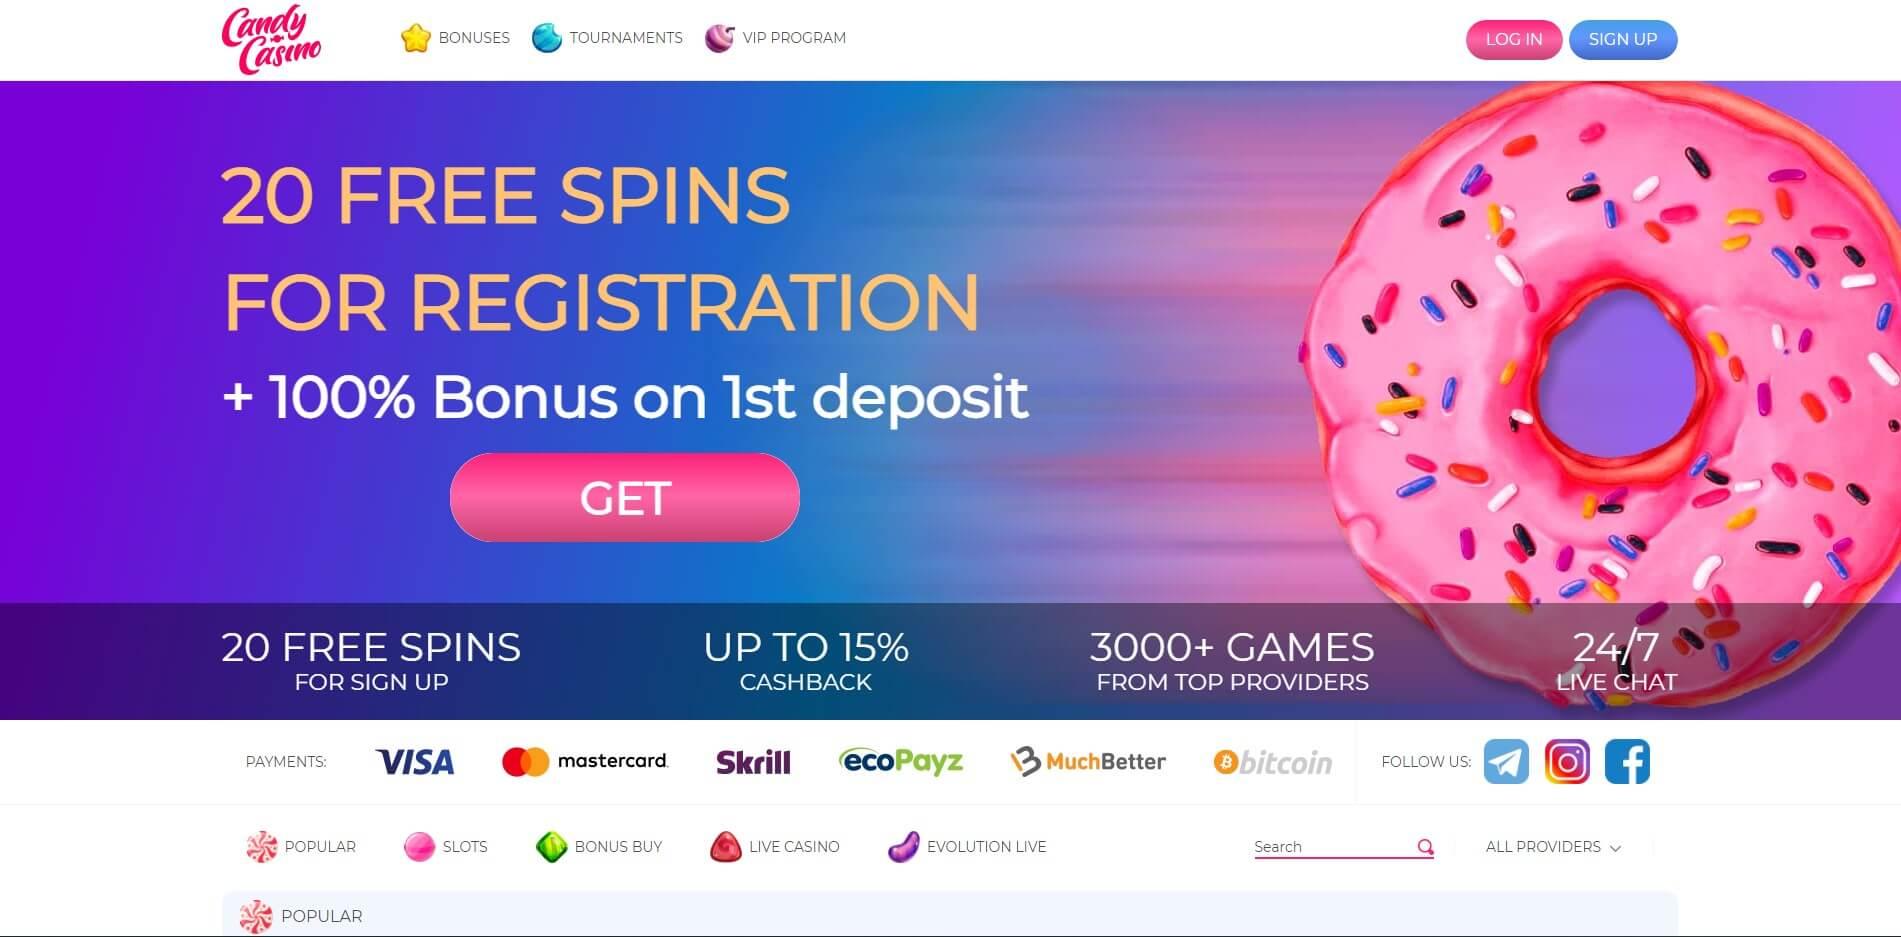 candy.casino - Website Review